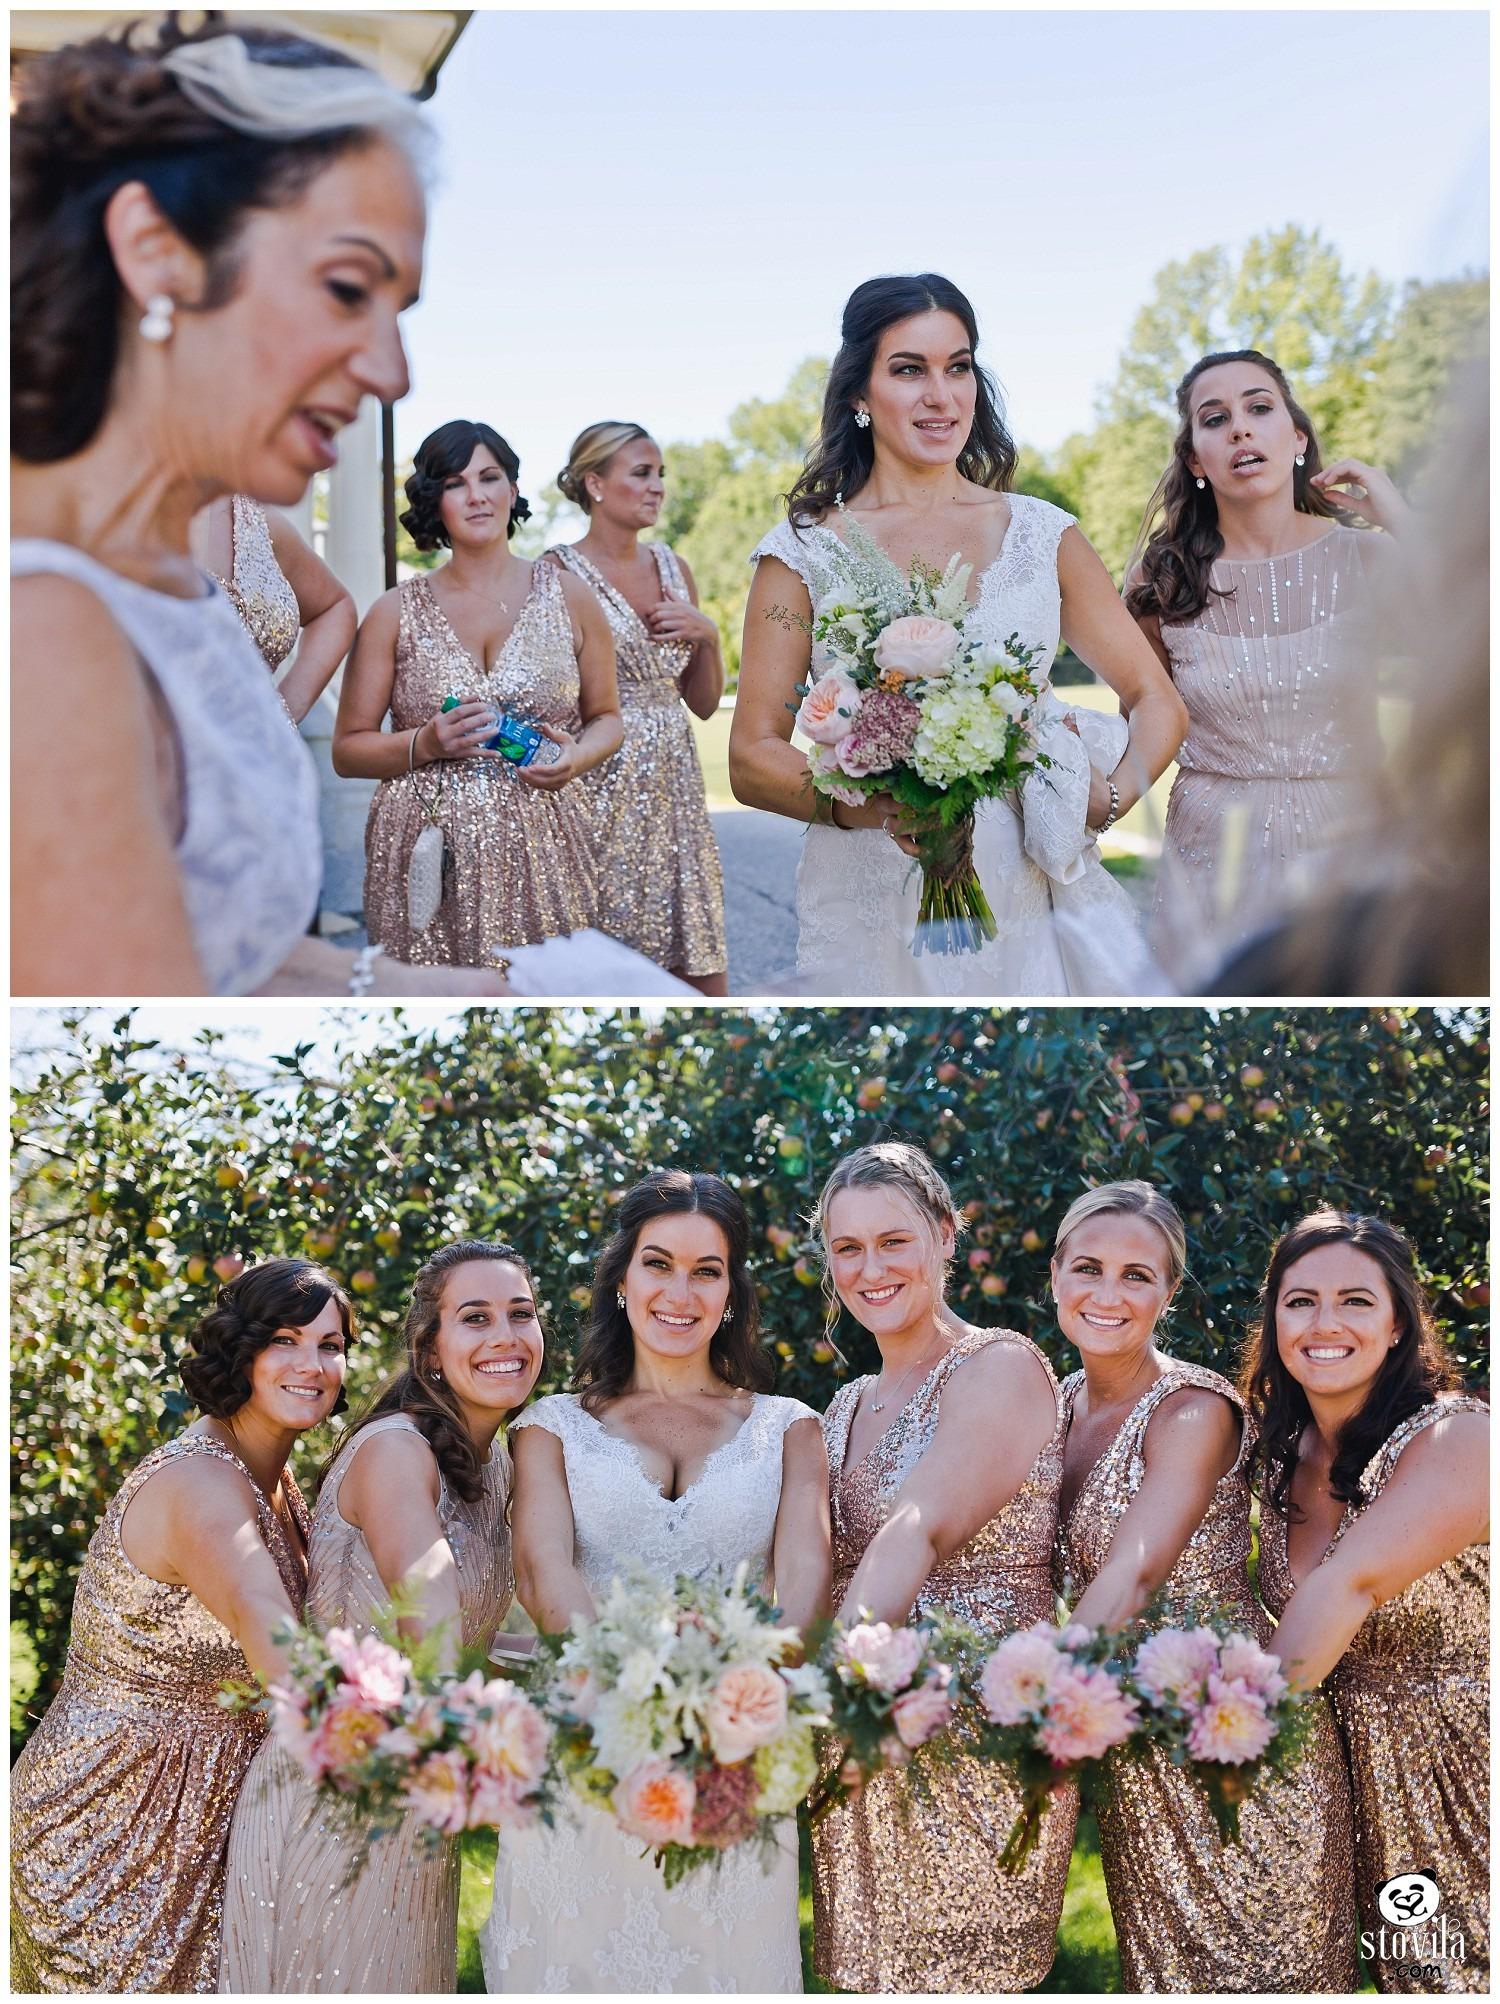 RD_Wedding_South Berwick University Maine - Stovila NH Photography (8)